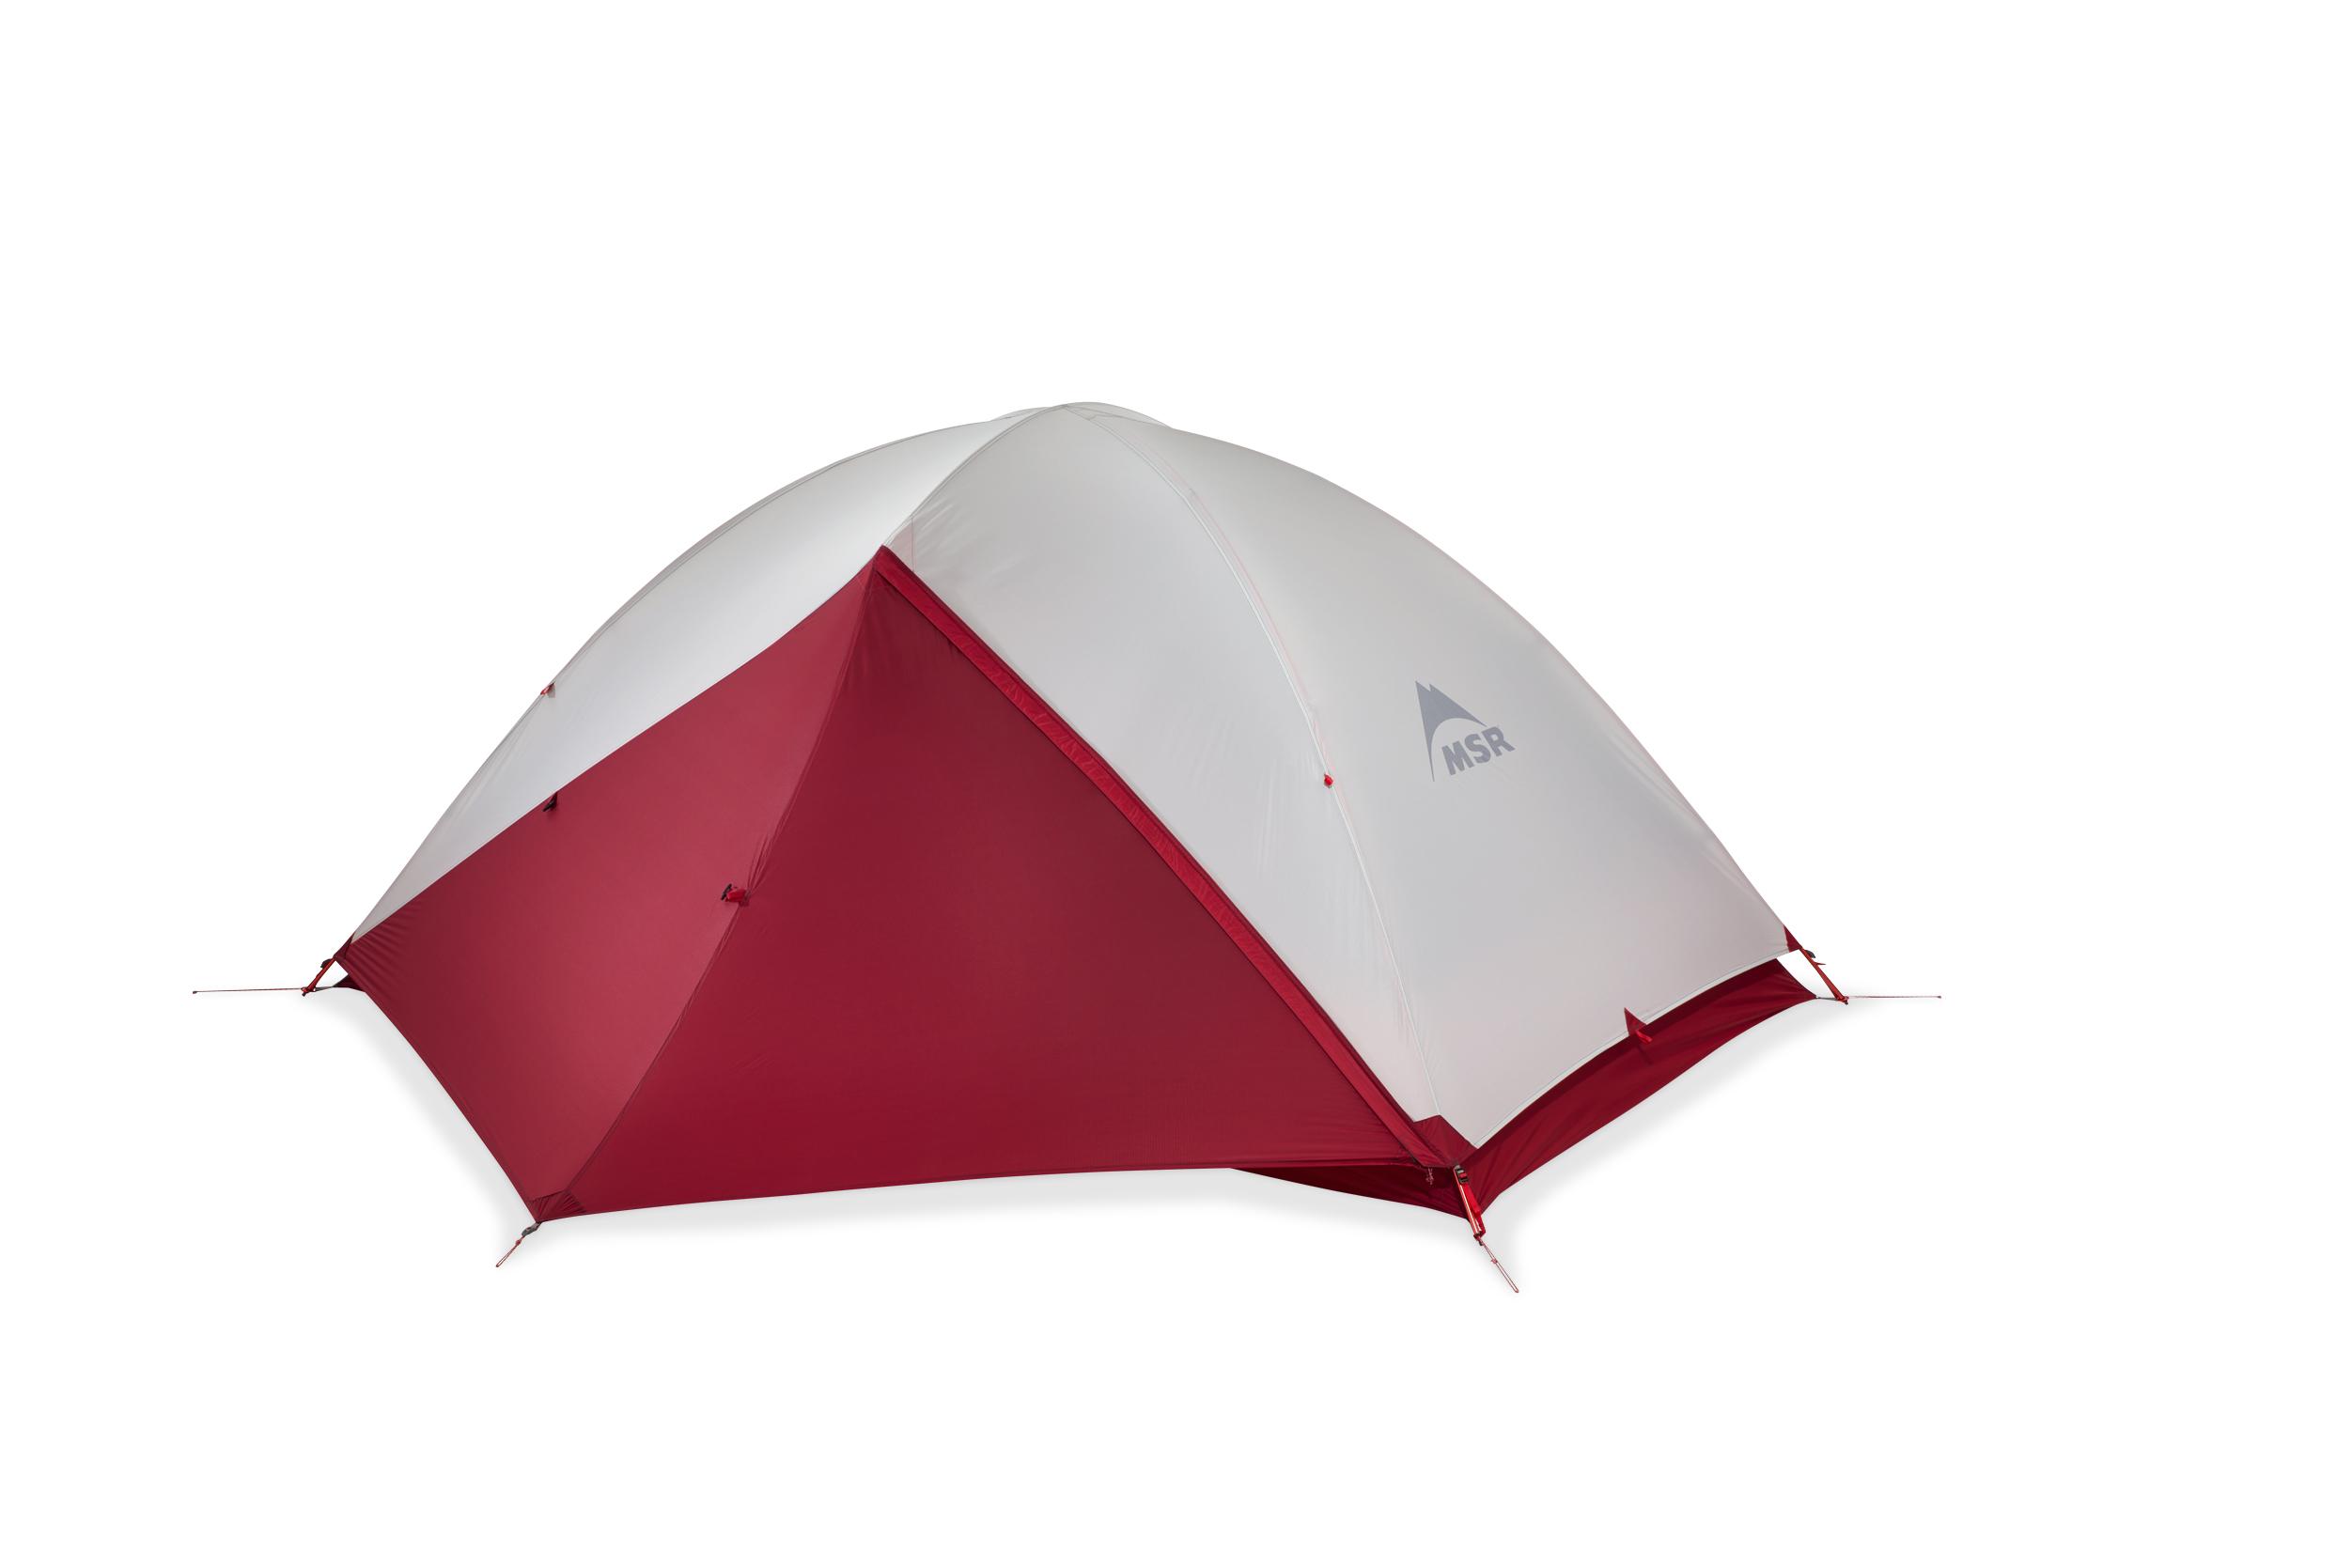 MSR Zoic 2 - Tent